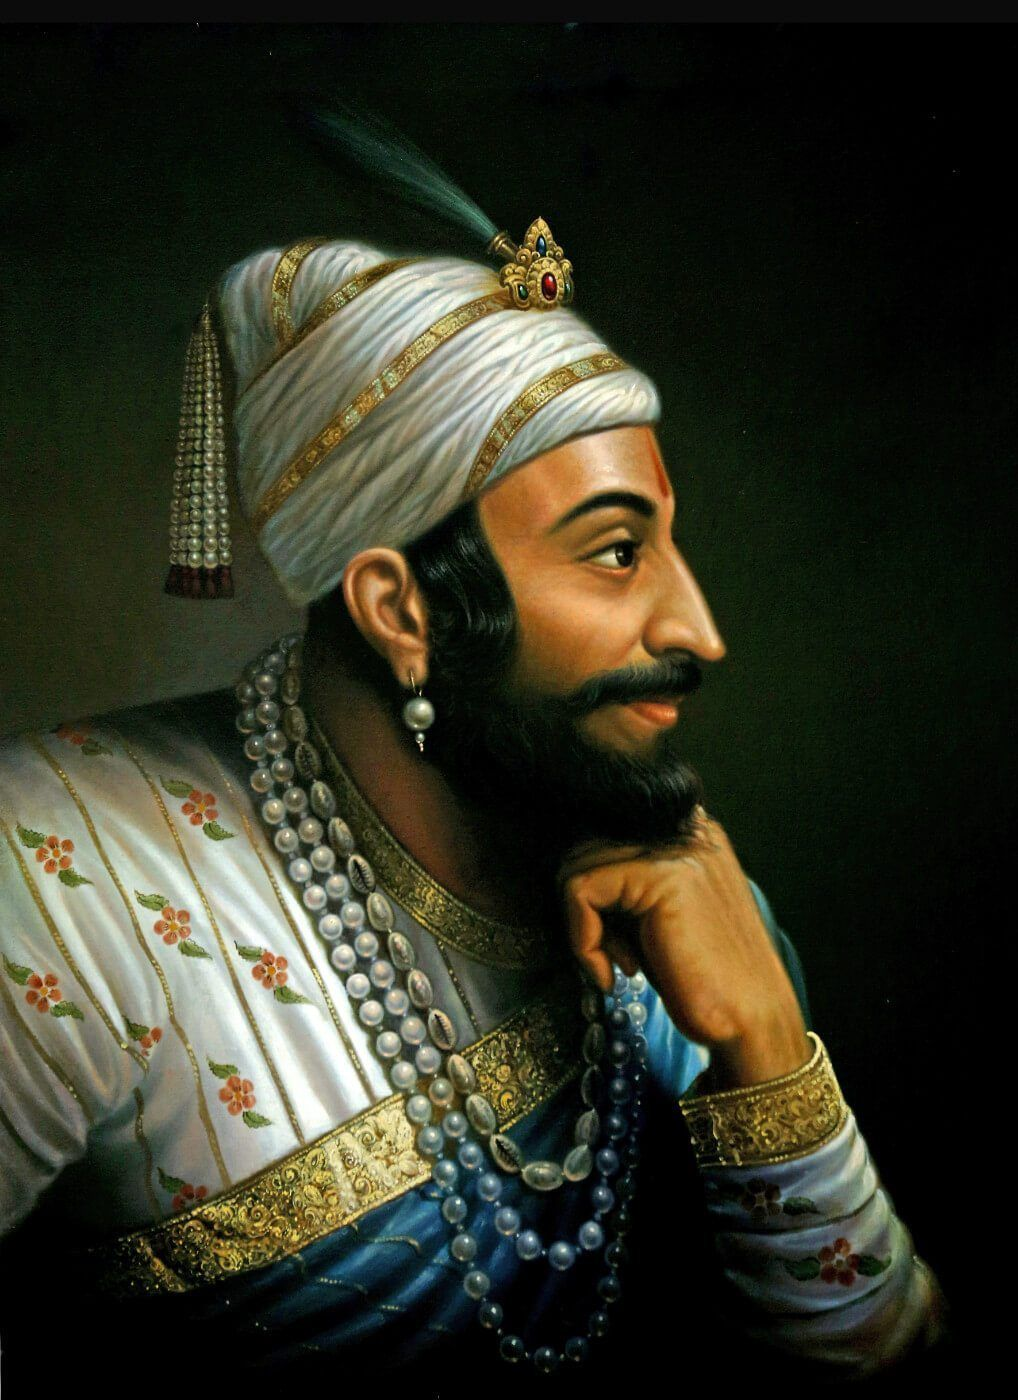 Shivaji Maharaj Painting 4 Shivaji Maharaj Painting, - Chatrapati Shivaji Maharaj Portrait , HD Wallpaper & Backgrounds